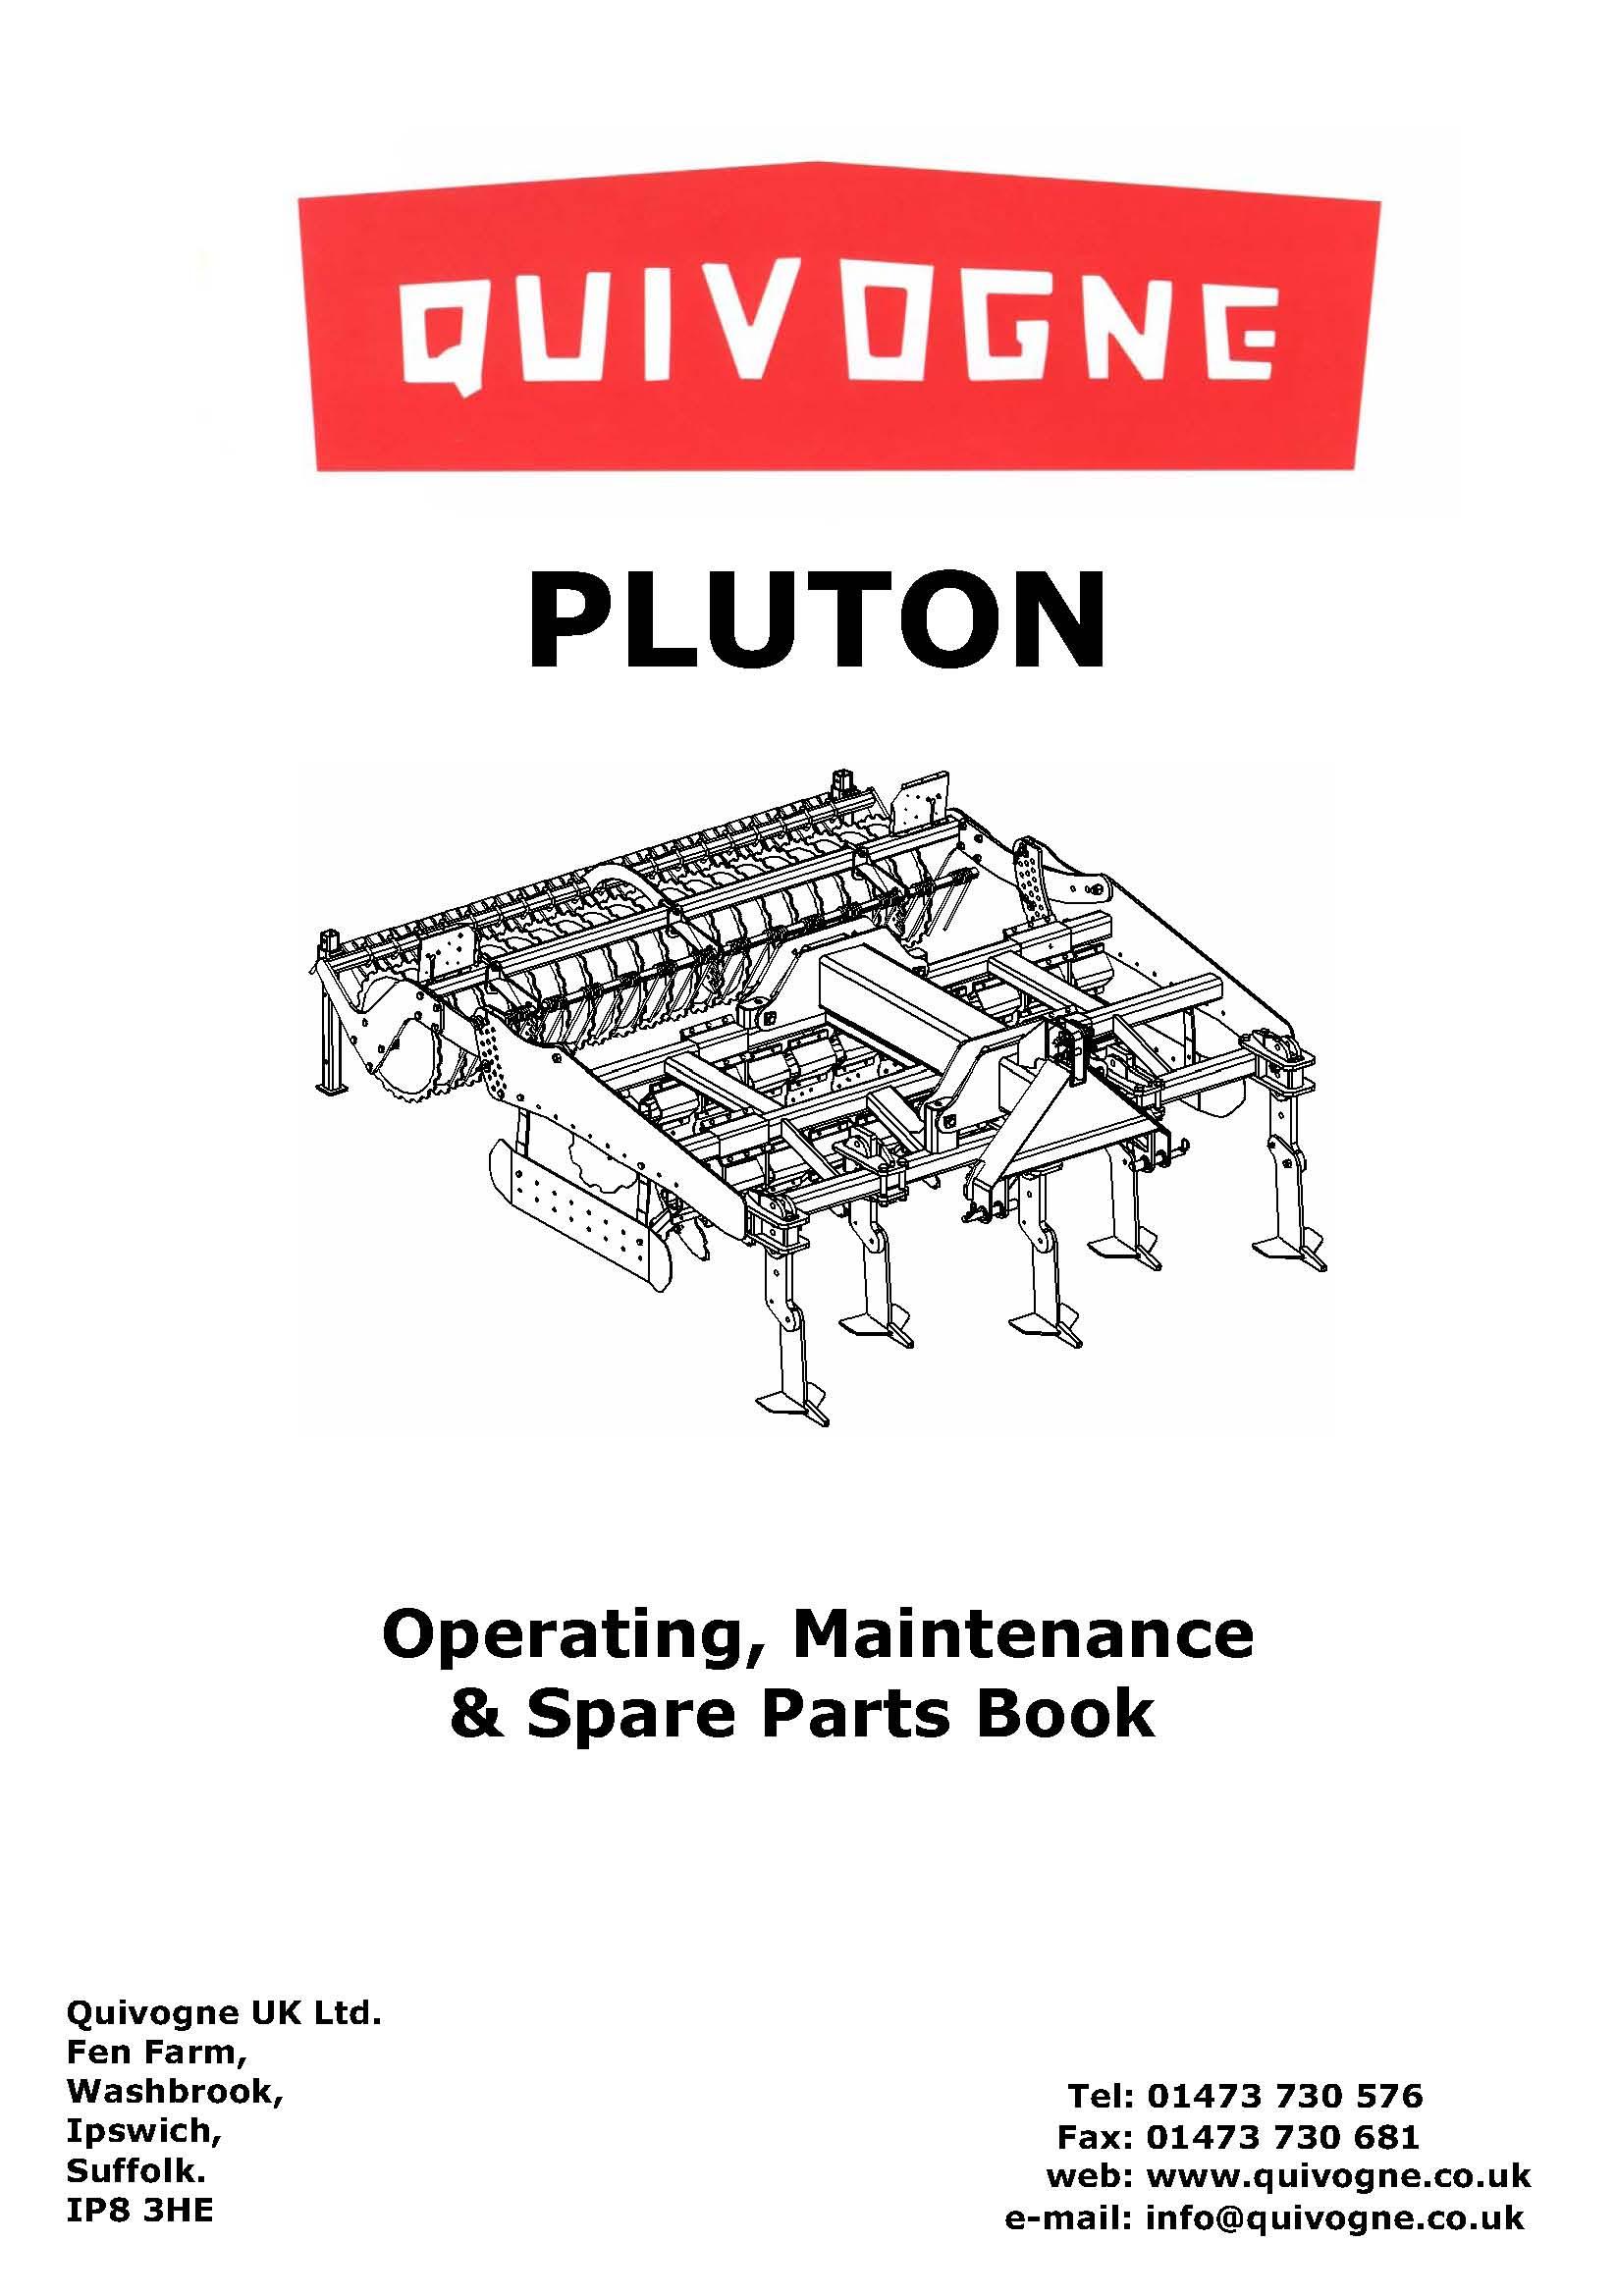 Pluton complete book